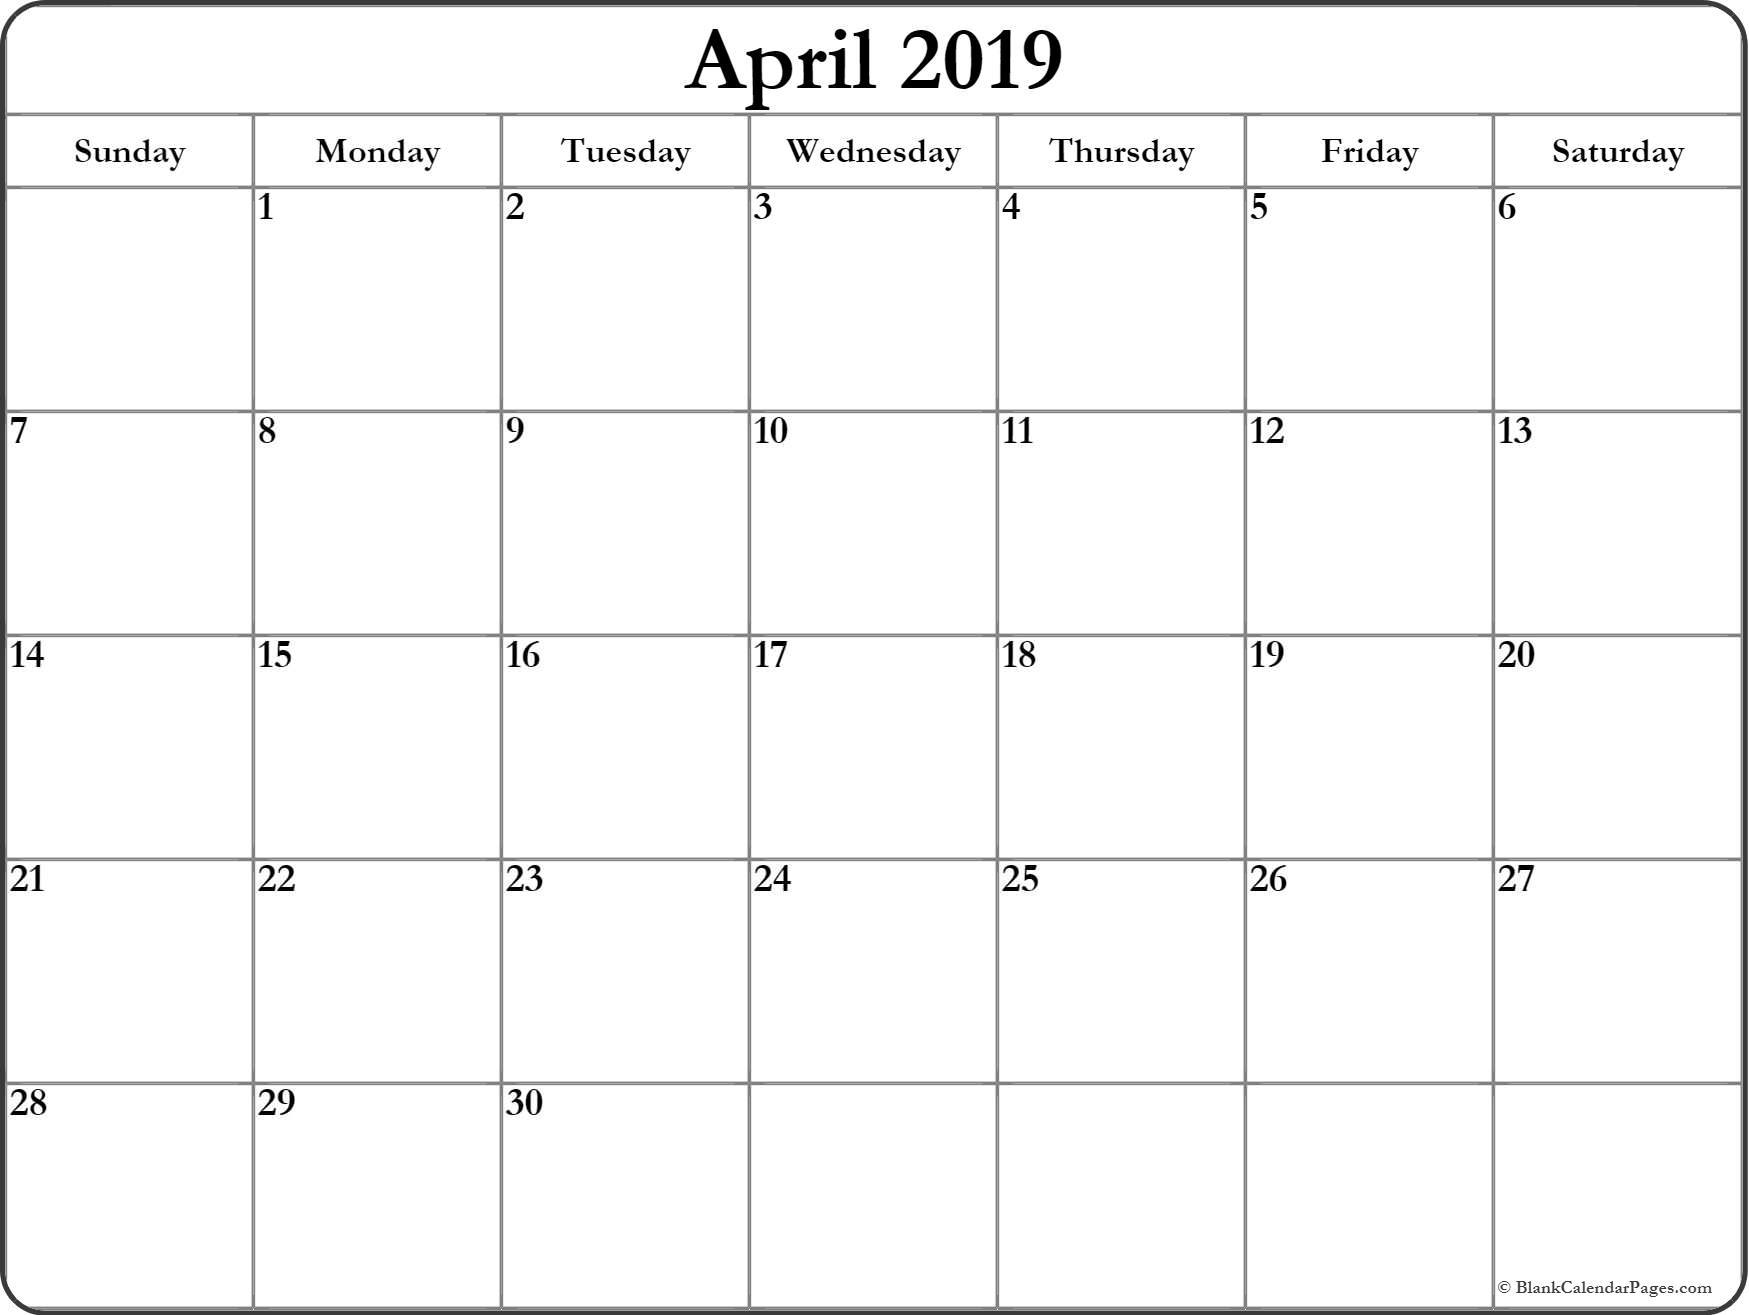 April 2019 Printable Calendar Page